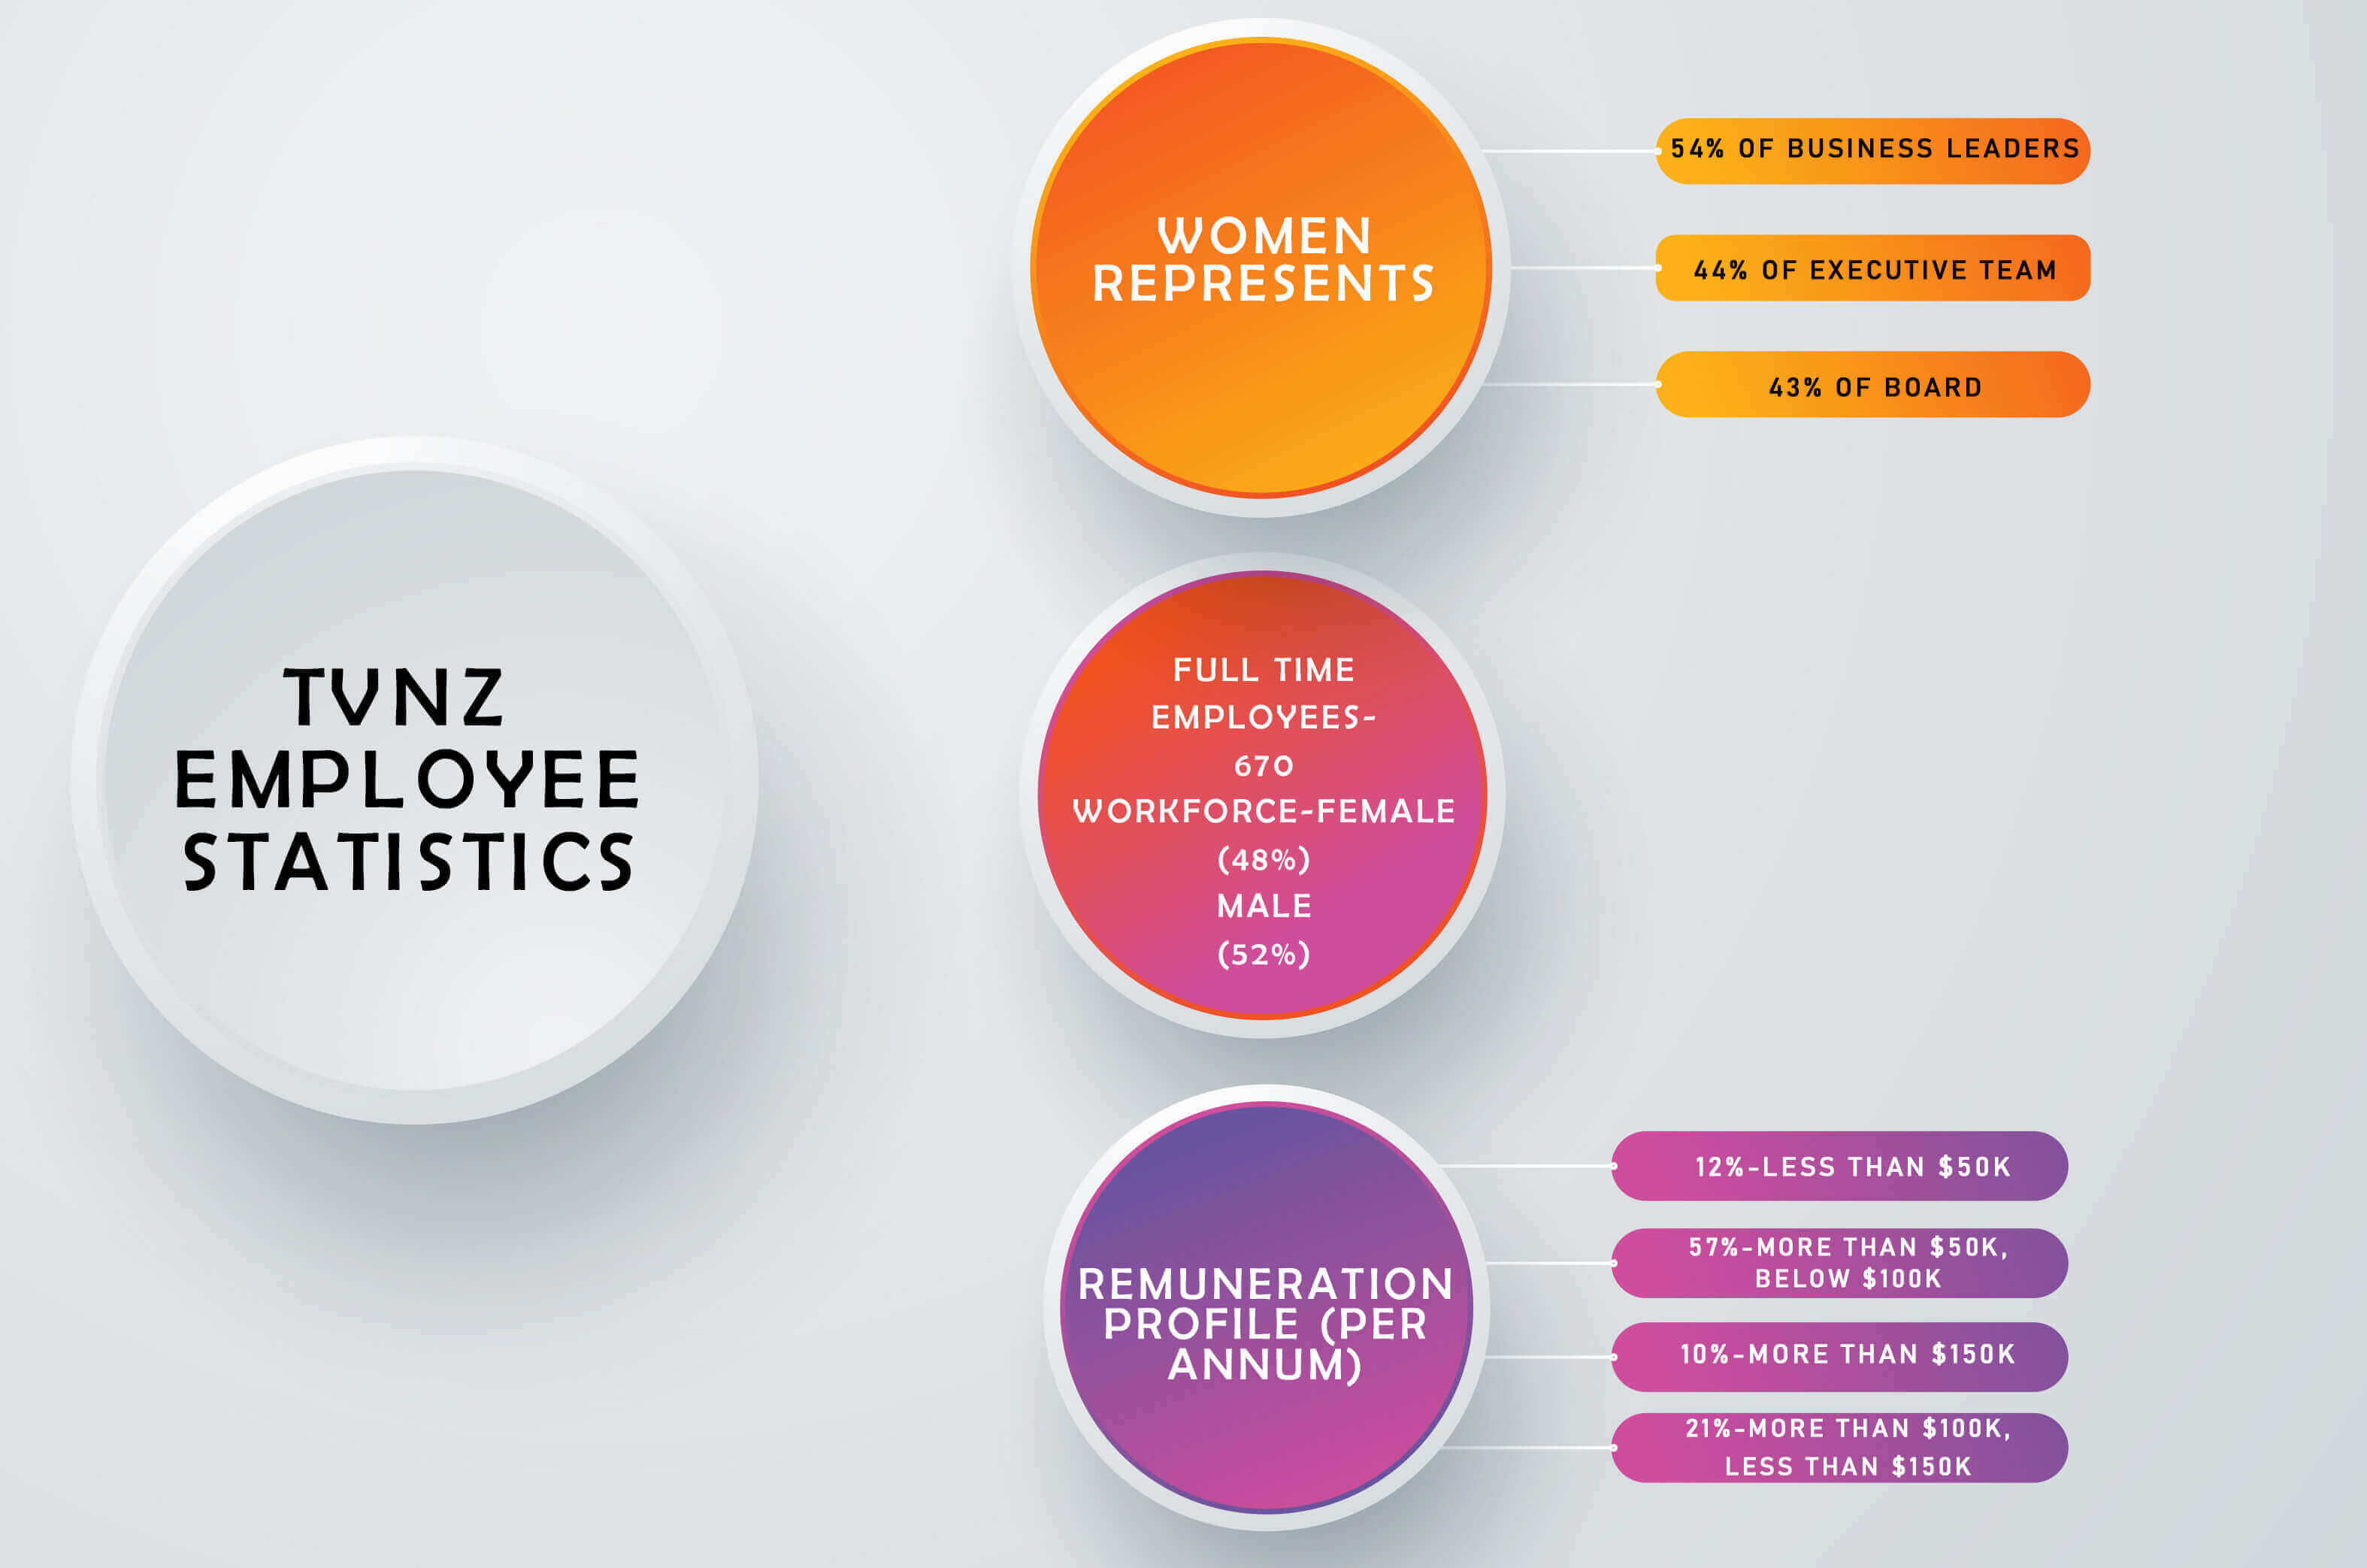 tvnz-employee-statistics